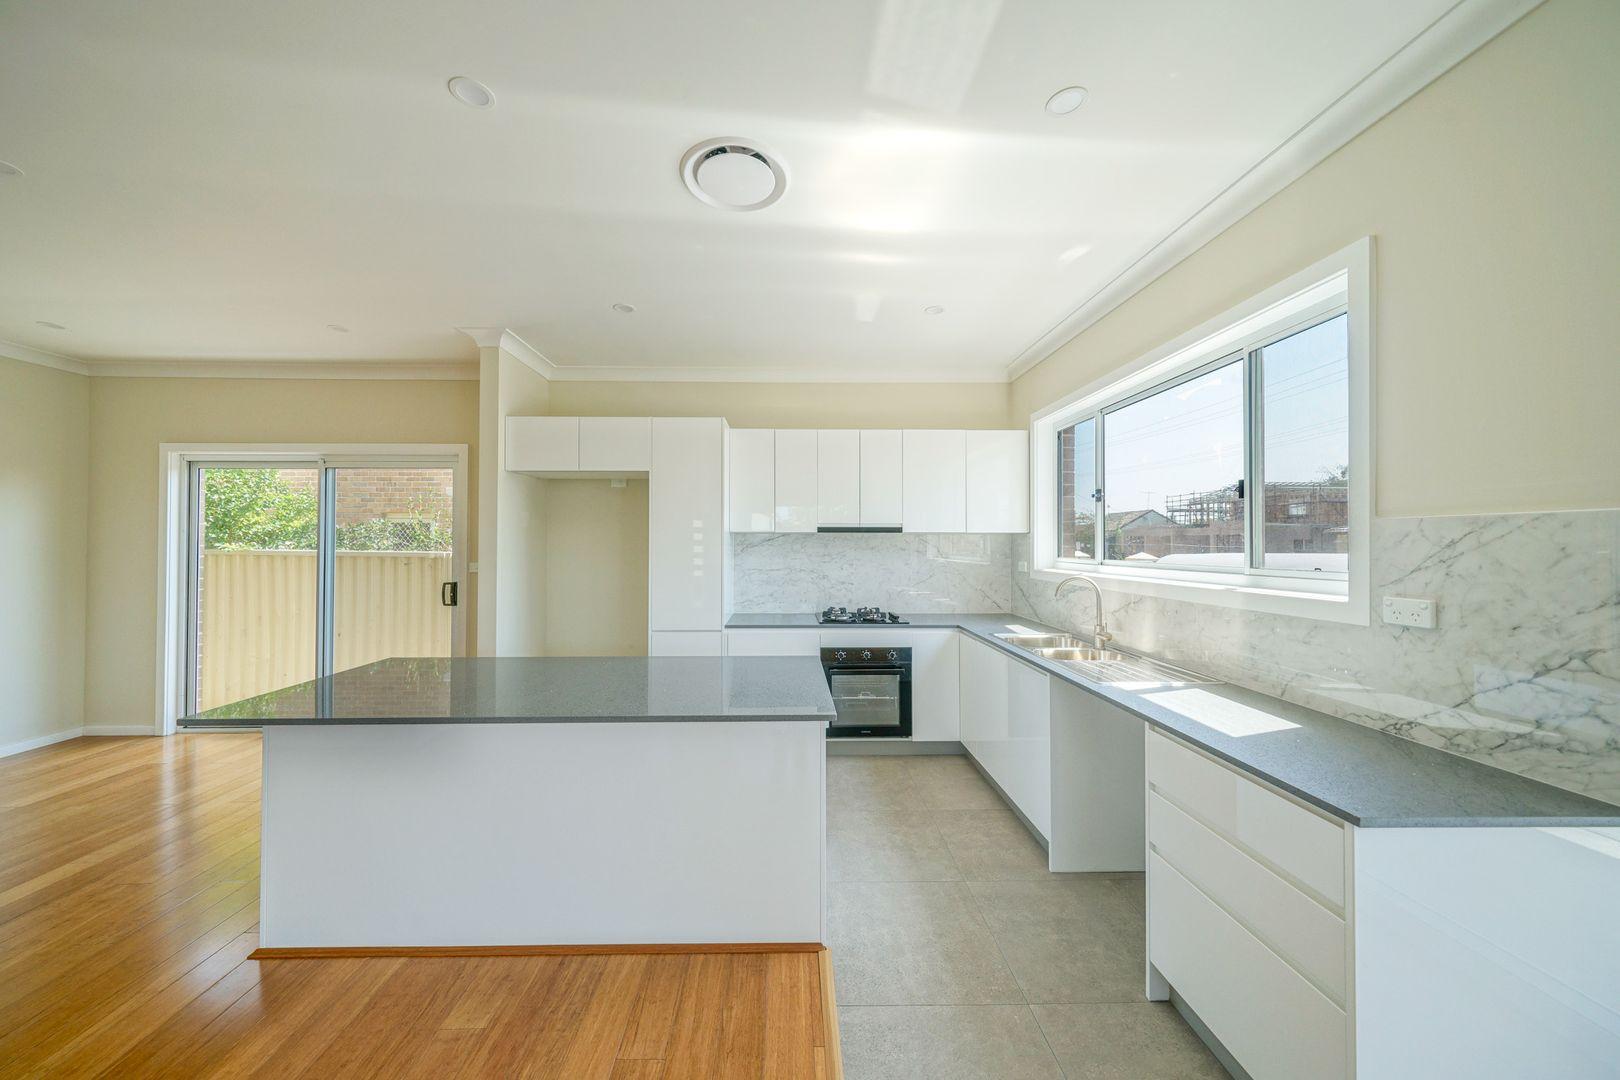 1/43 Anzac Road, Long Jetty NSW 2261, Image 1